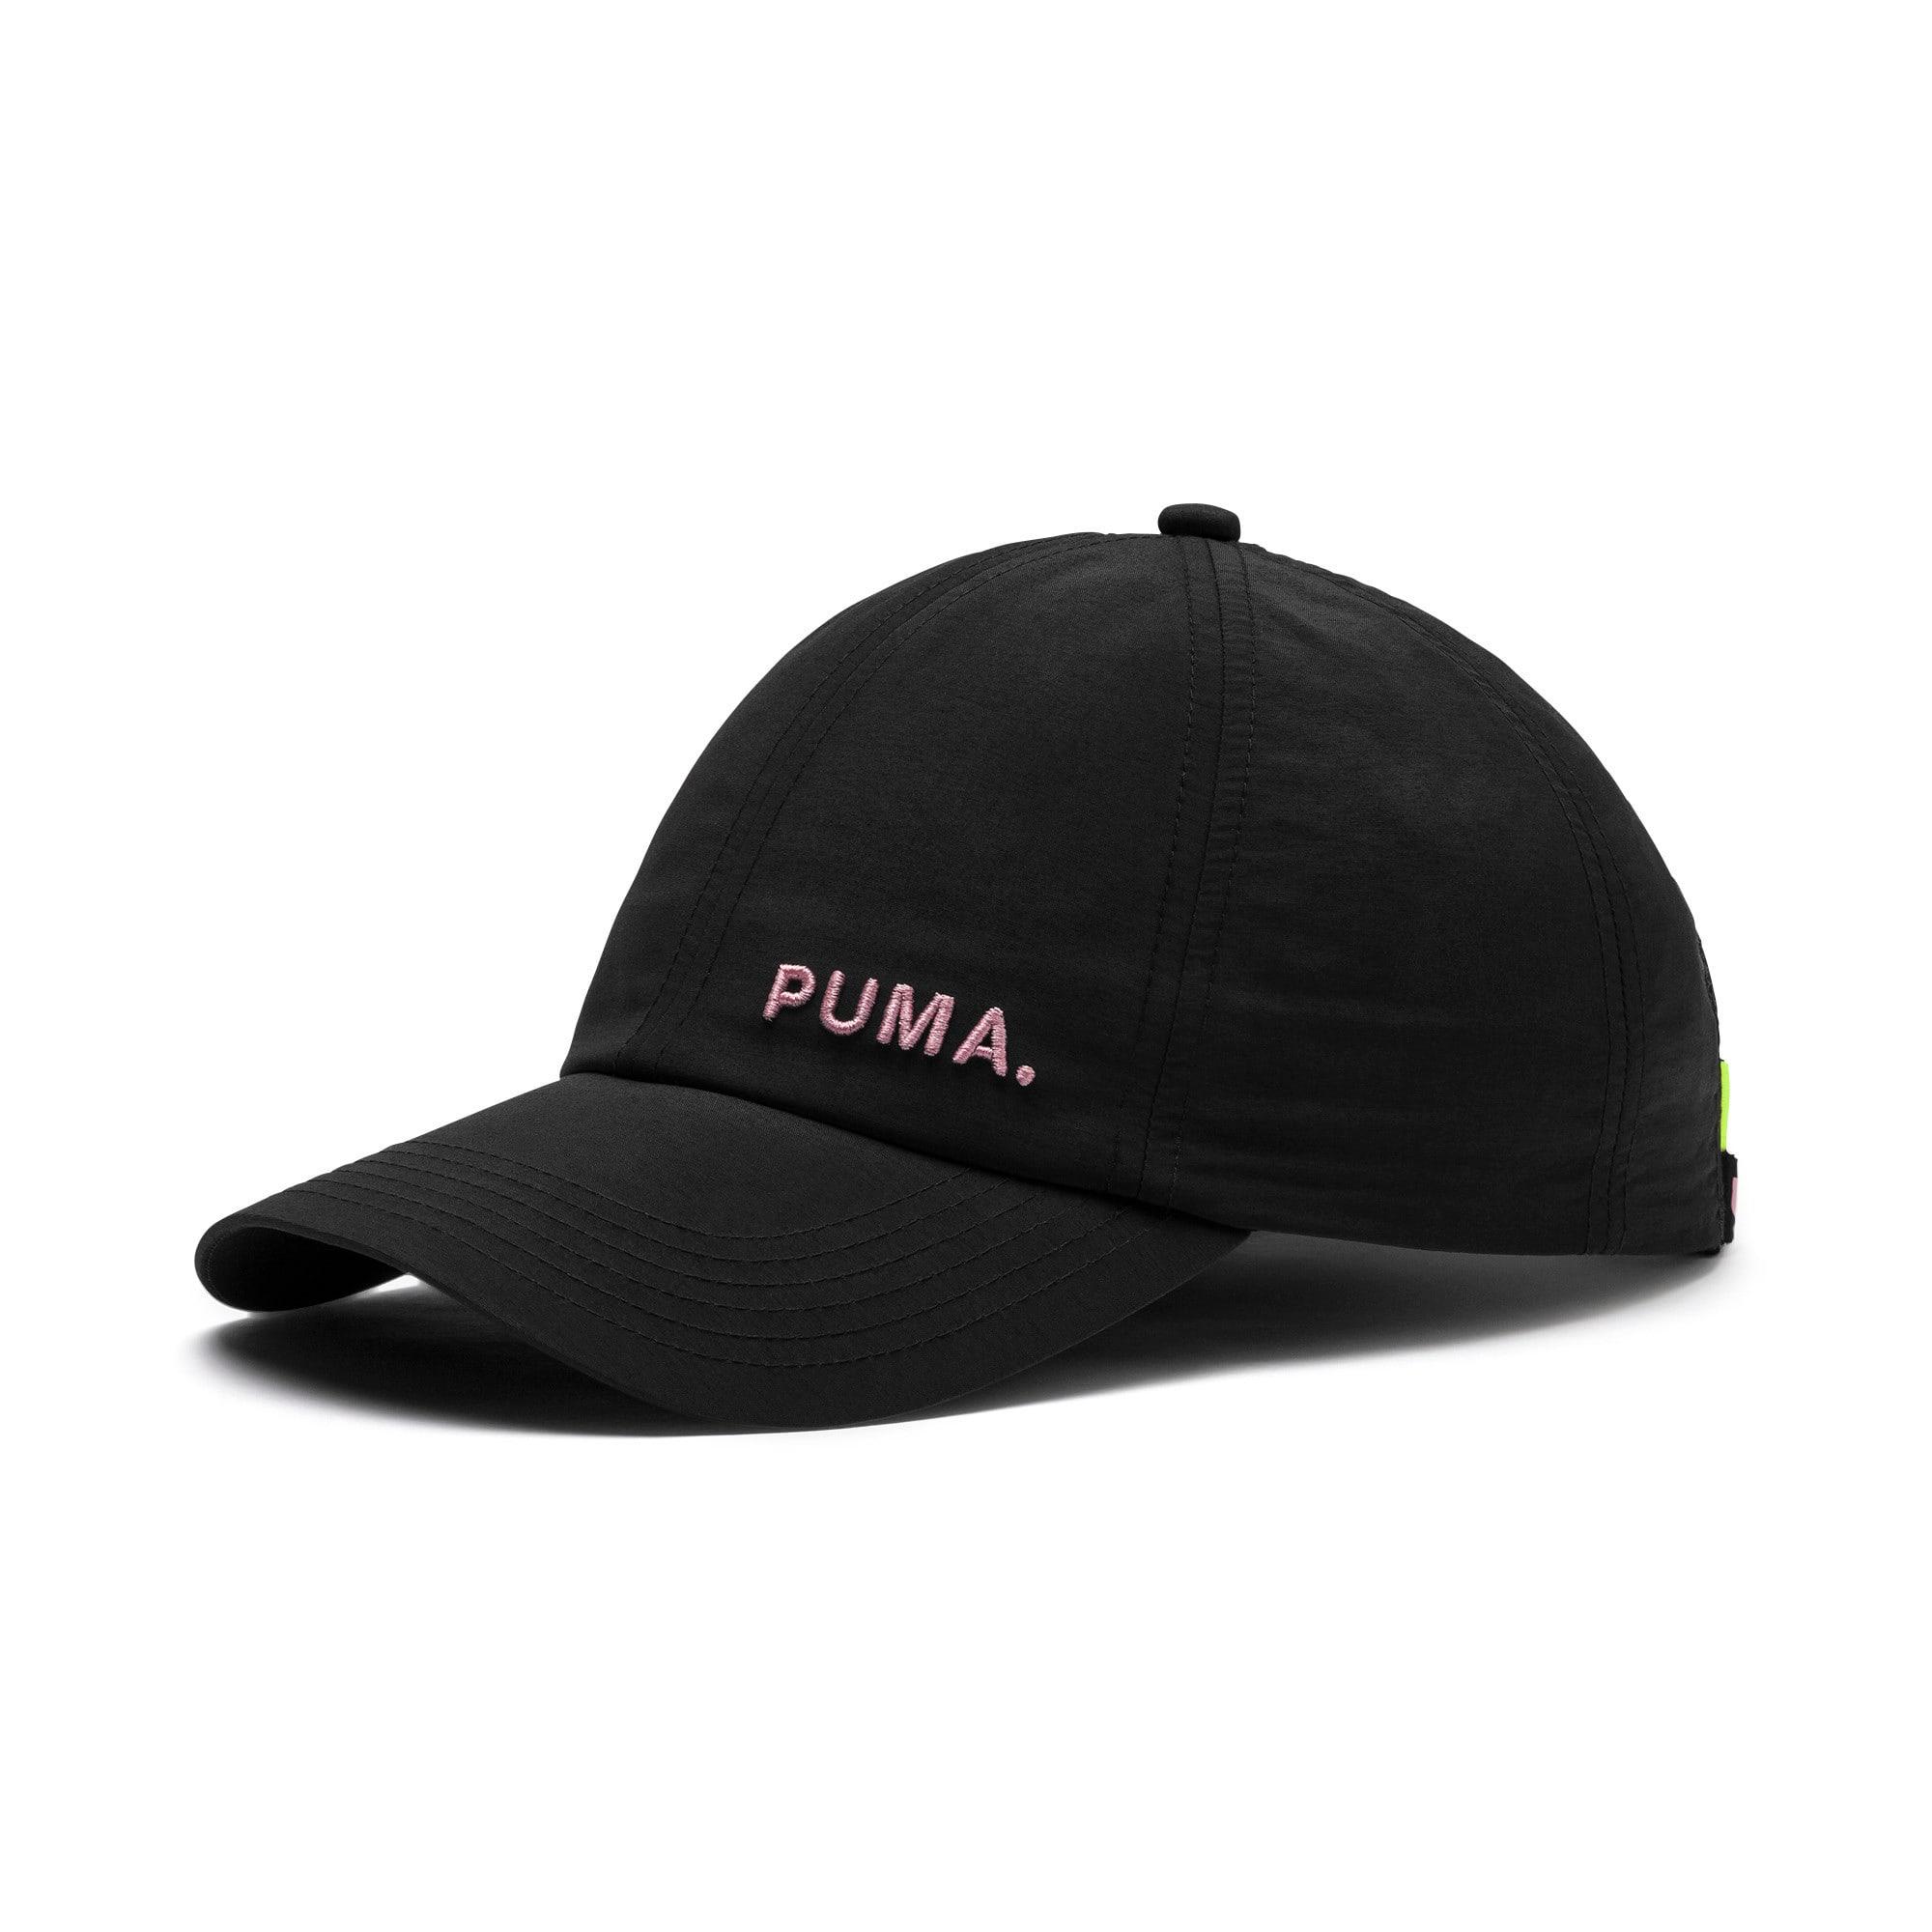 Thumbnail 1 of Shift Damen Cap, Puma Black-Bridal Rose, medium